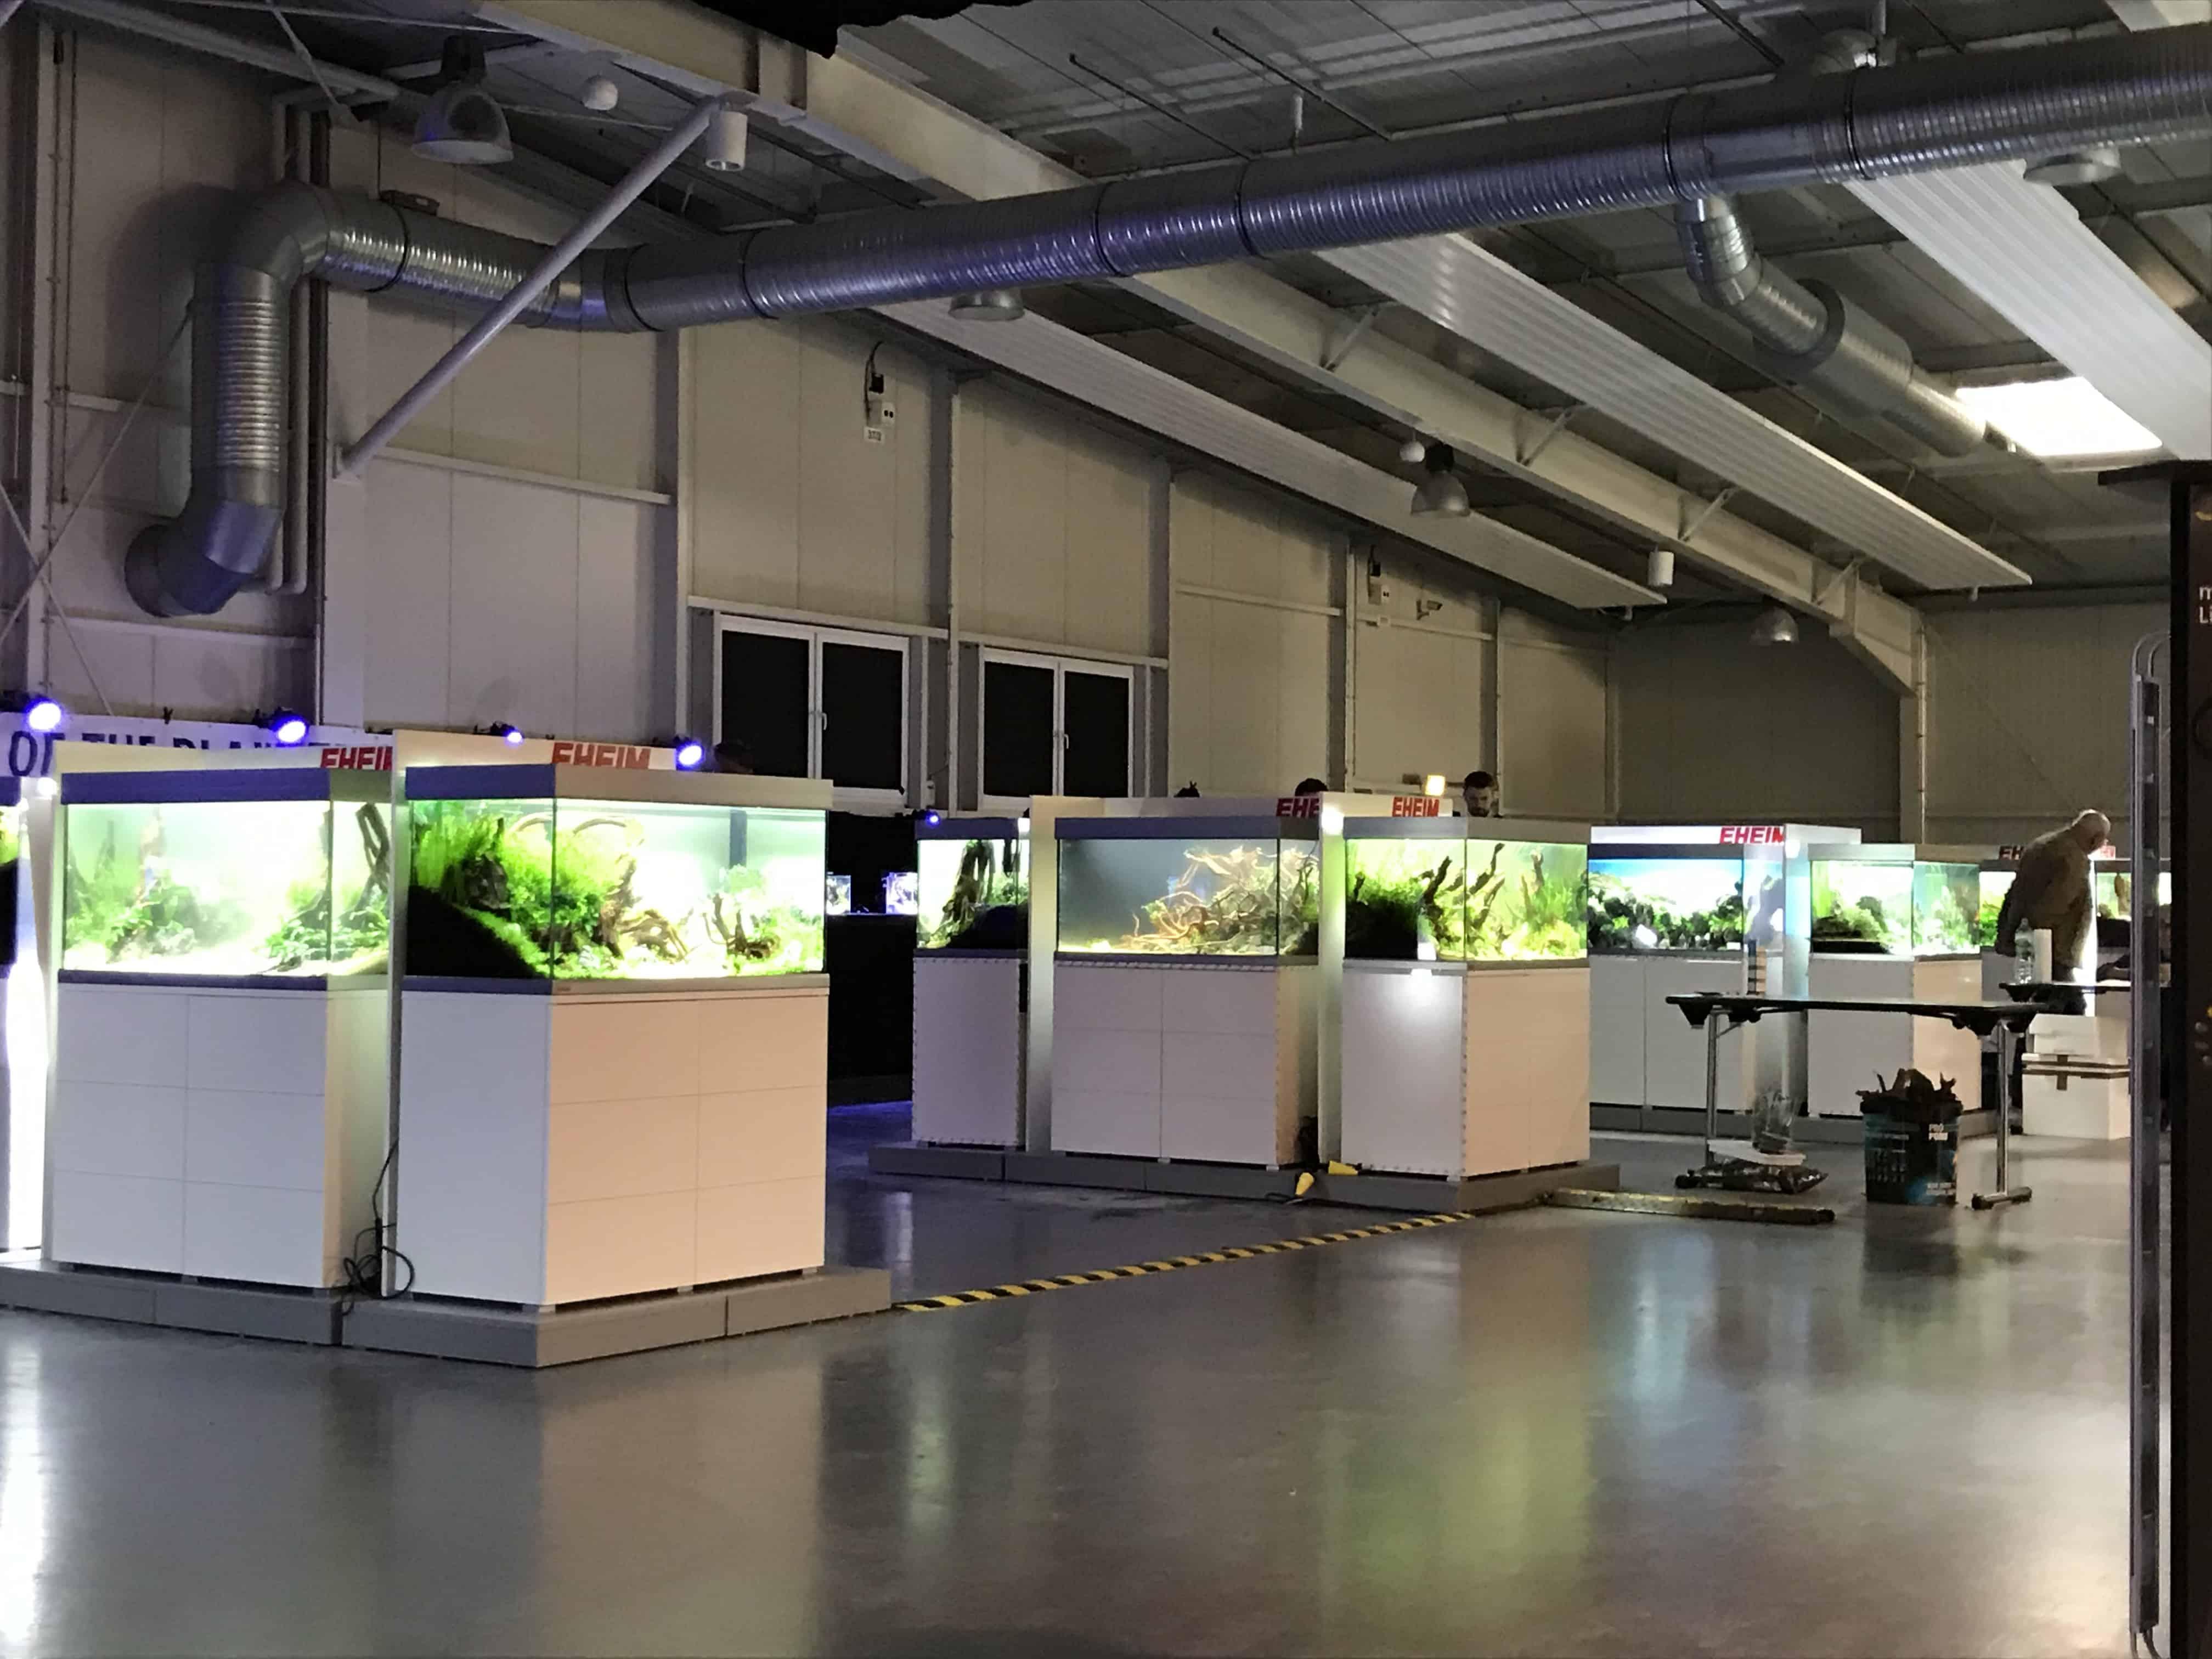 199 - Tierwelt Magdeburg 2019 - TAOTPA, EAPLC & Aquarium Design Meisterschule (Tobias Gawrisch) 8